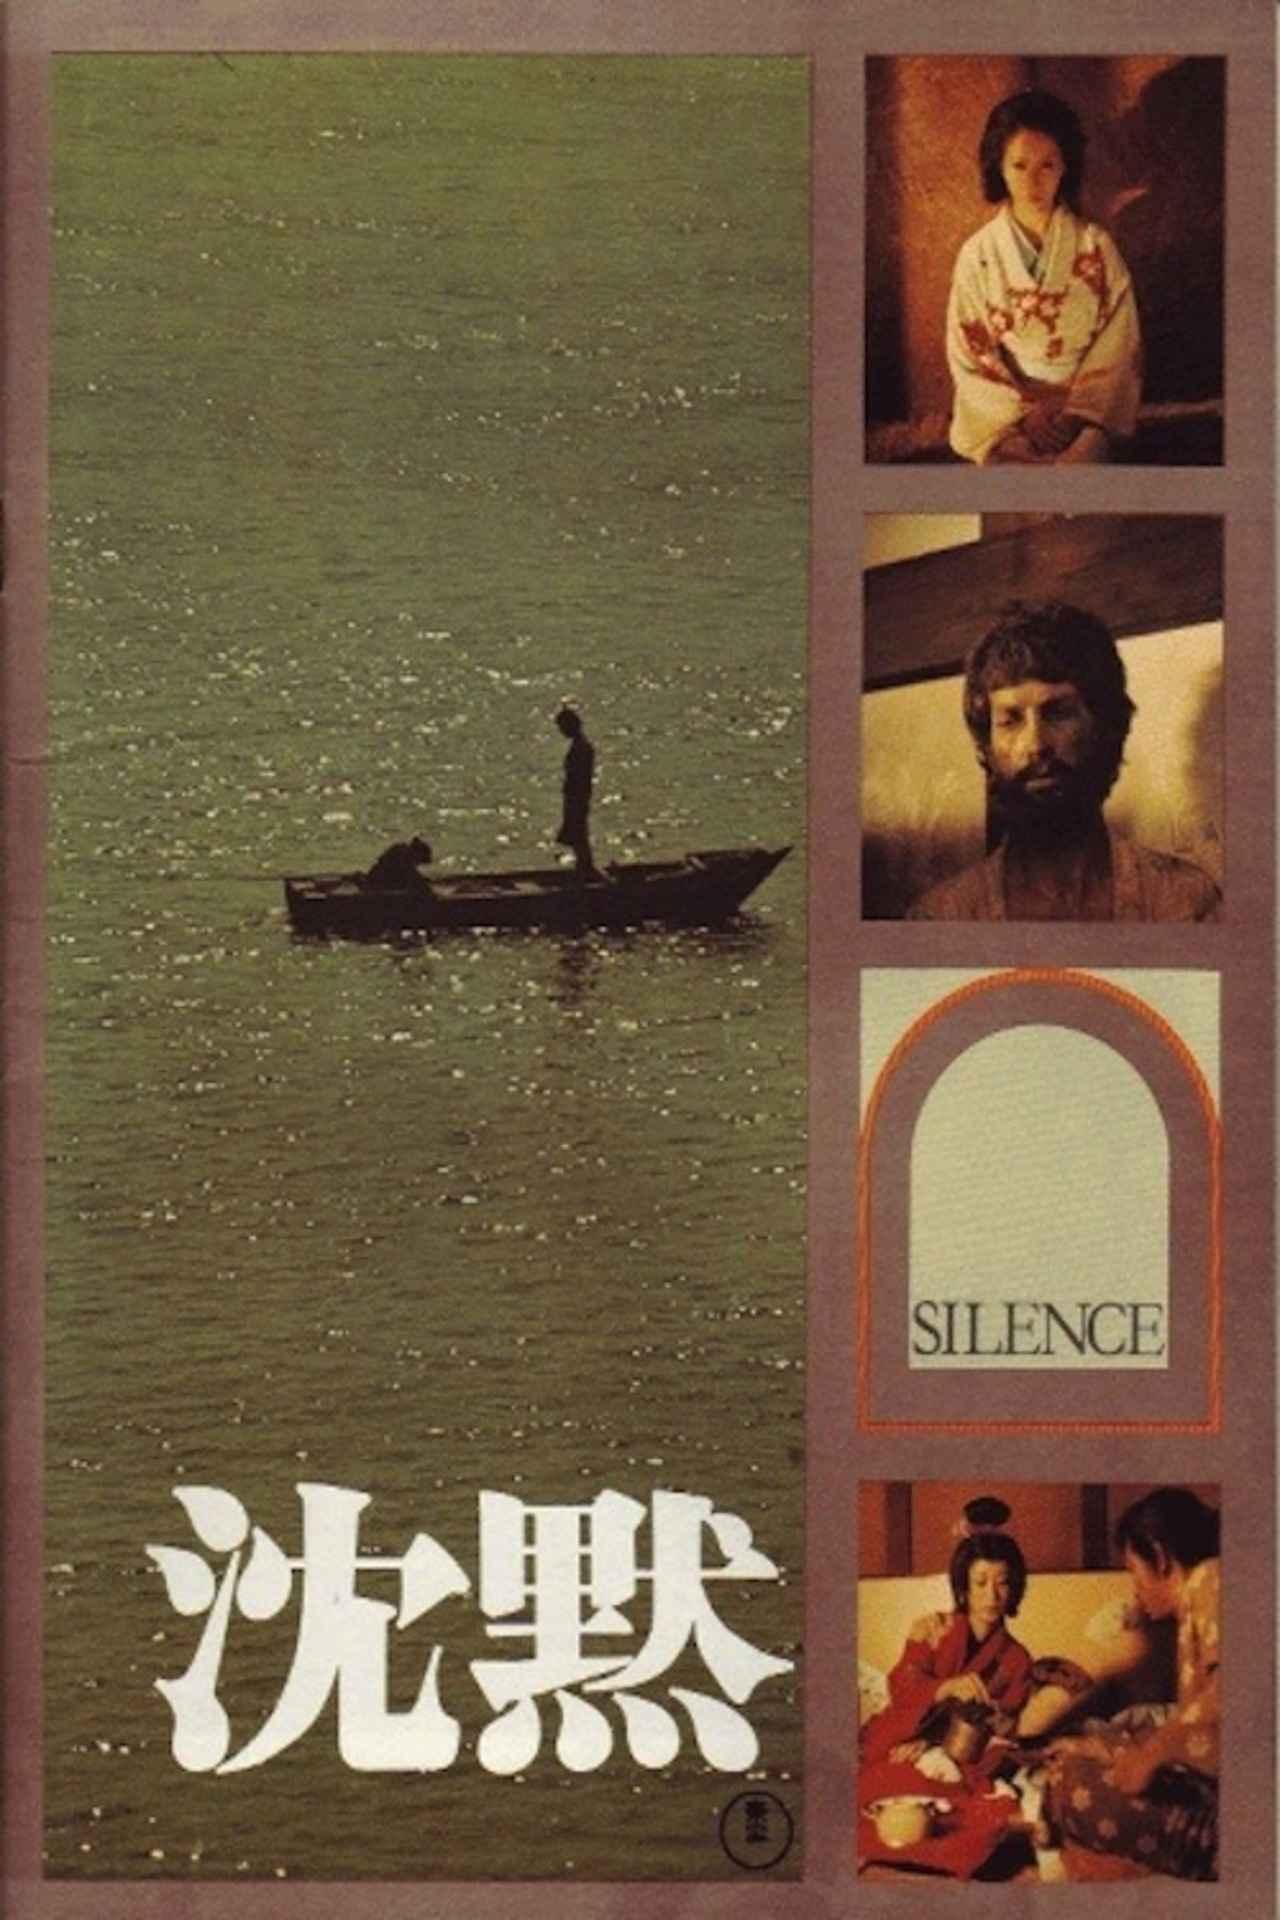 画像: http://www.english-subtitles.club/movies/1971-chinmoku.html